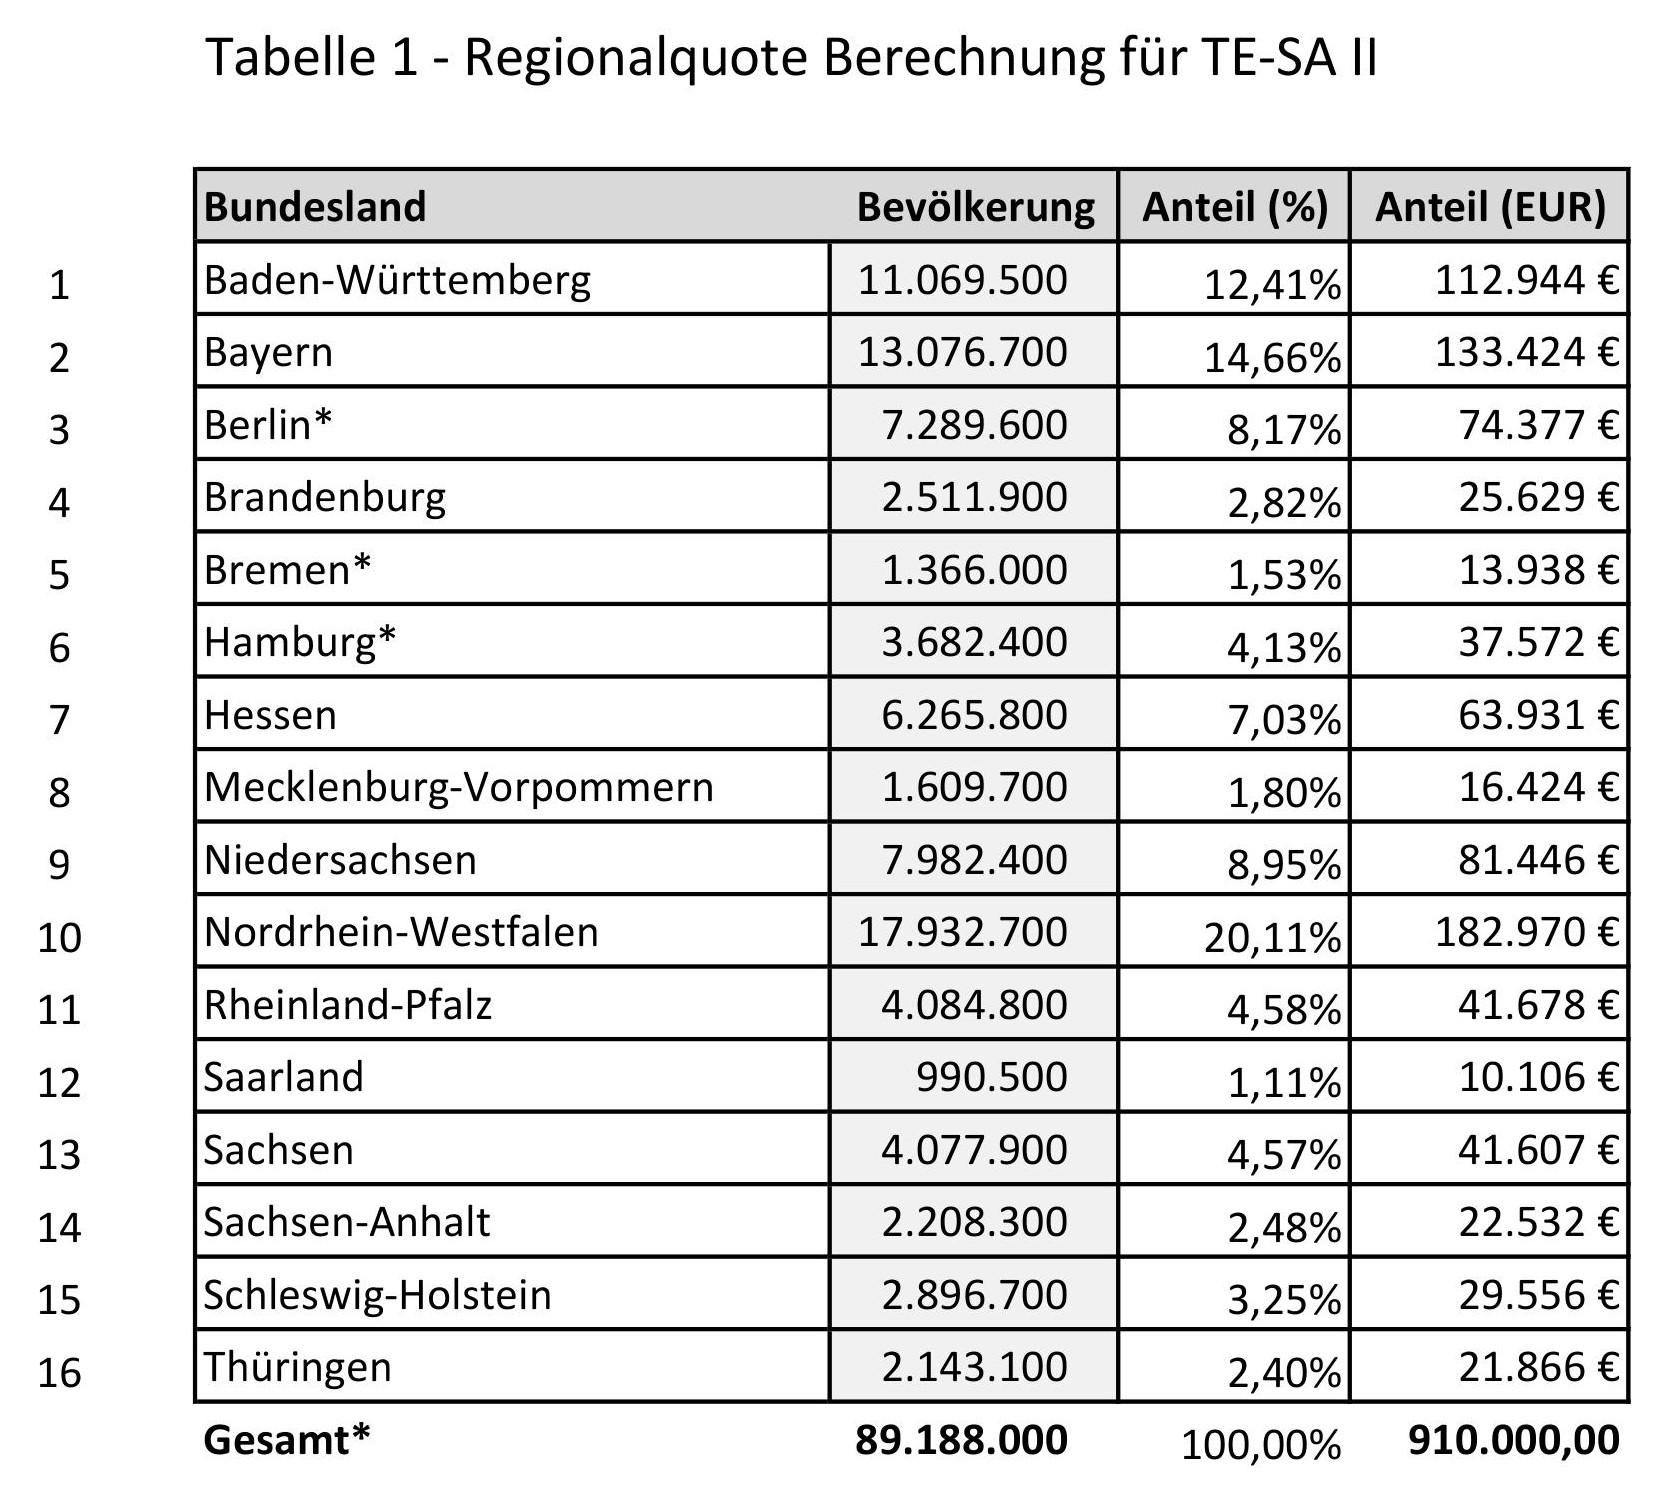 Regionalquote TE-SA